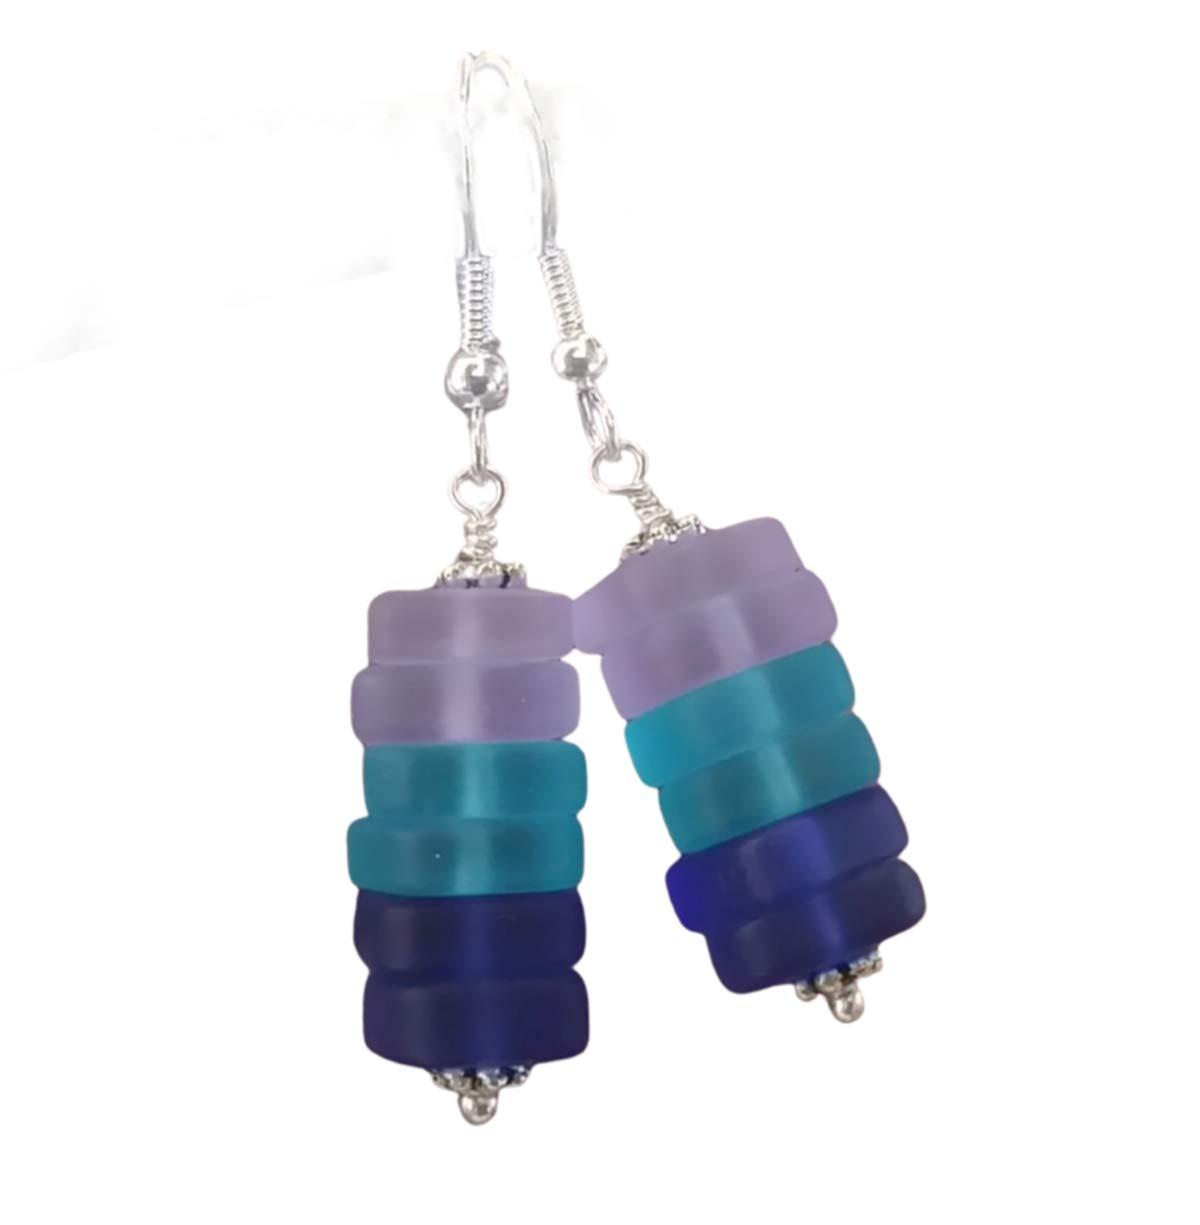 Handmade sea glass jewelry from Hawaii,Purple blue cobalt sea glass earrings,Dangle earrings, (Hawaii Gift Wrapped, Customizable Gift Message)